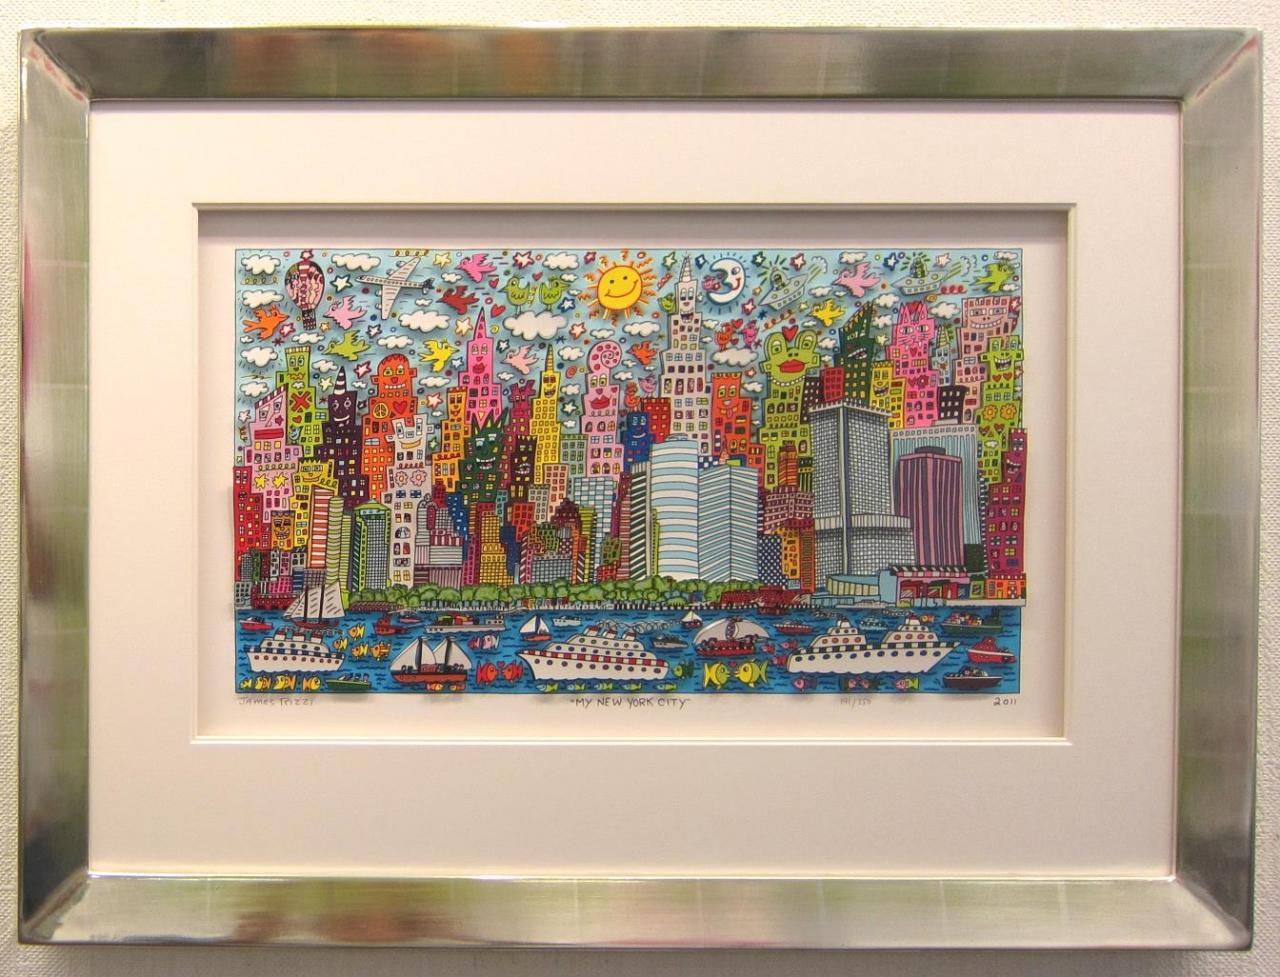 My New York City 2011 gerahmt im Vergolder mit Grün